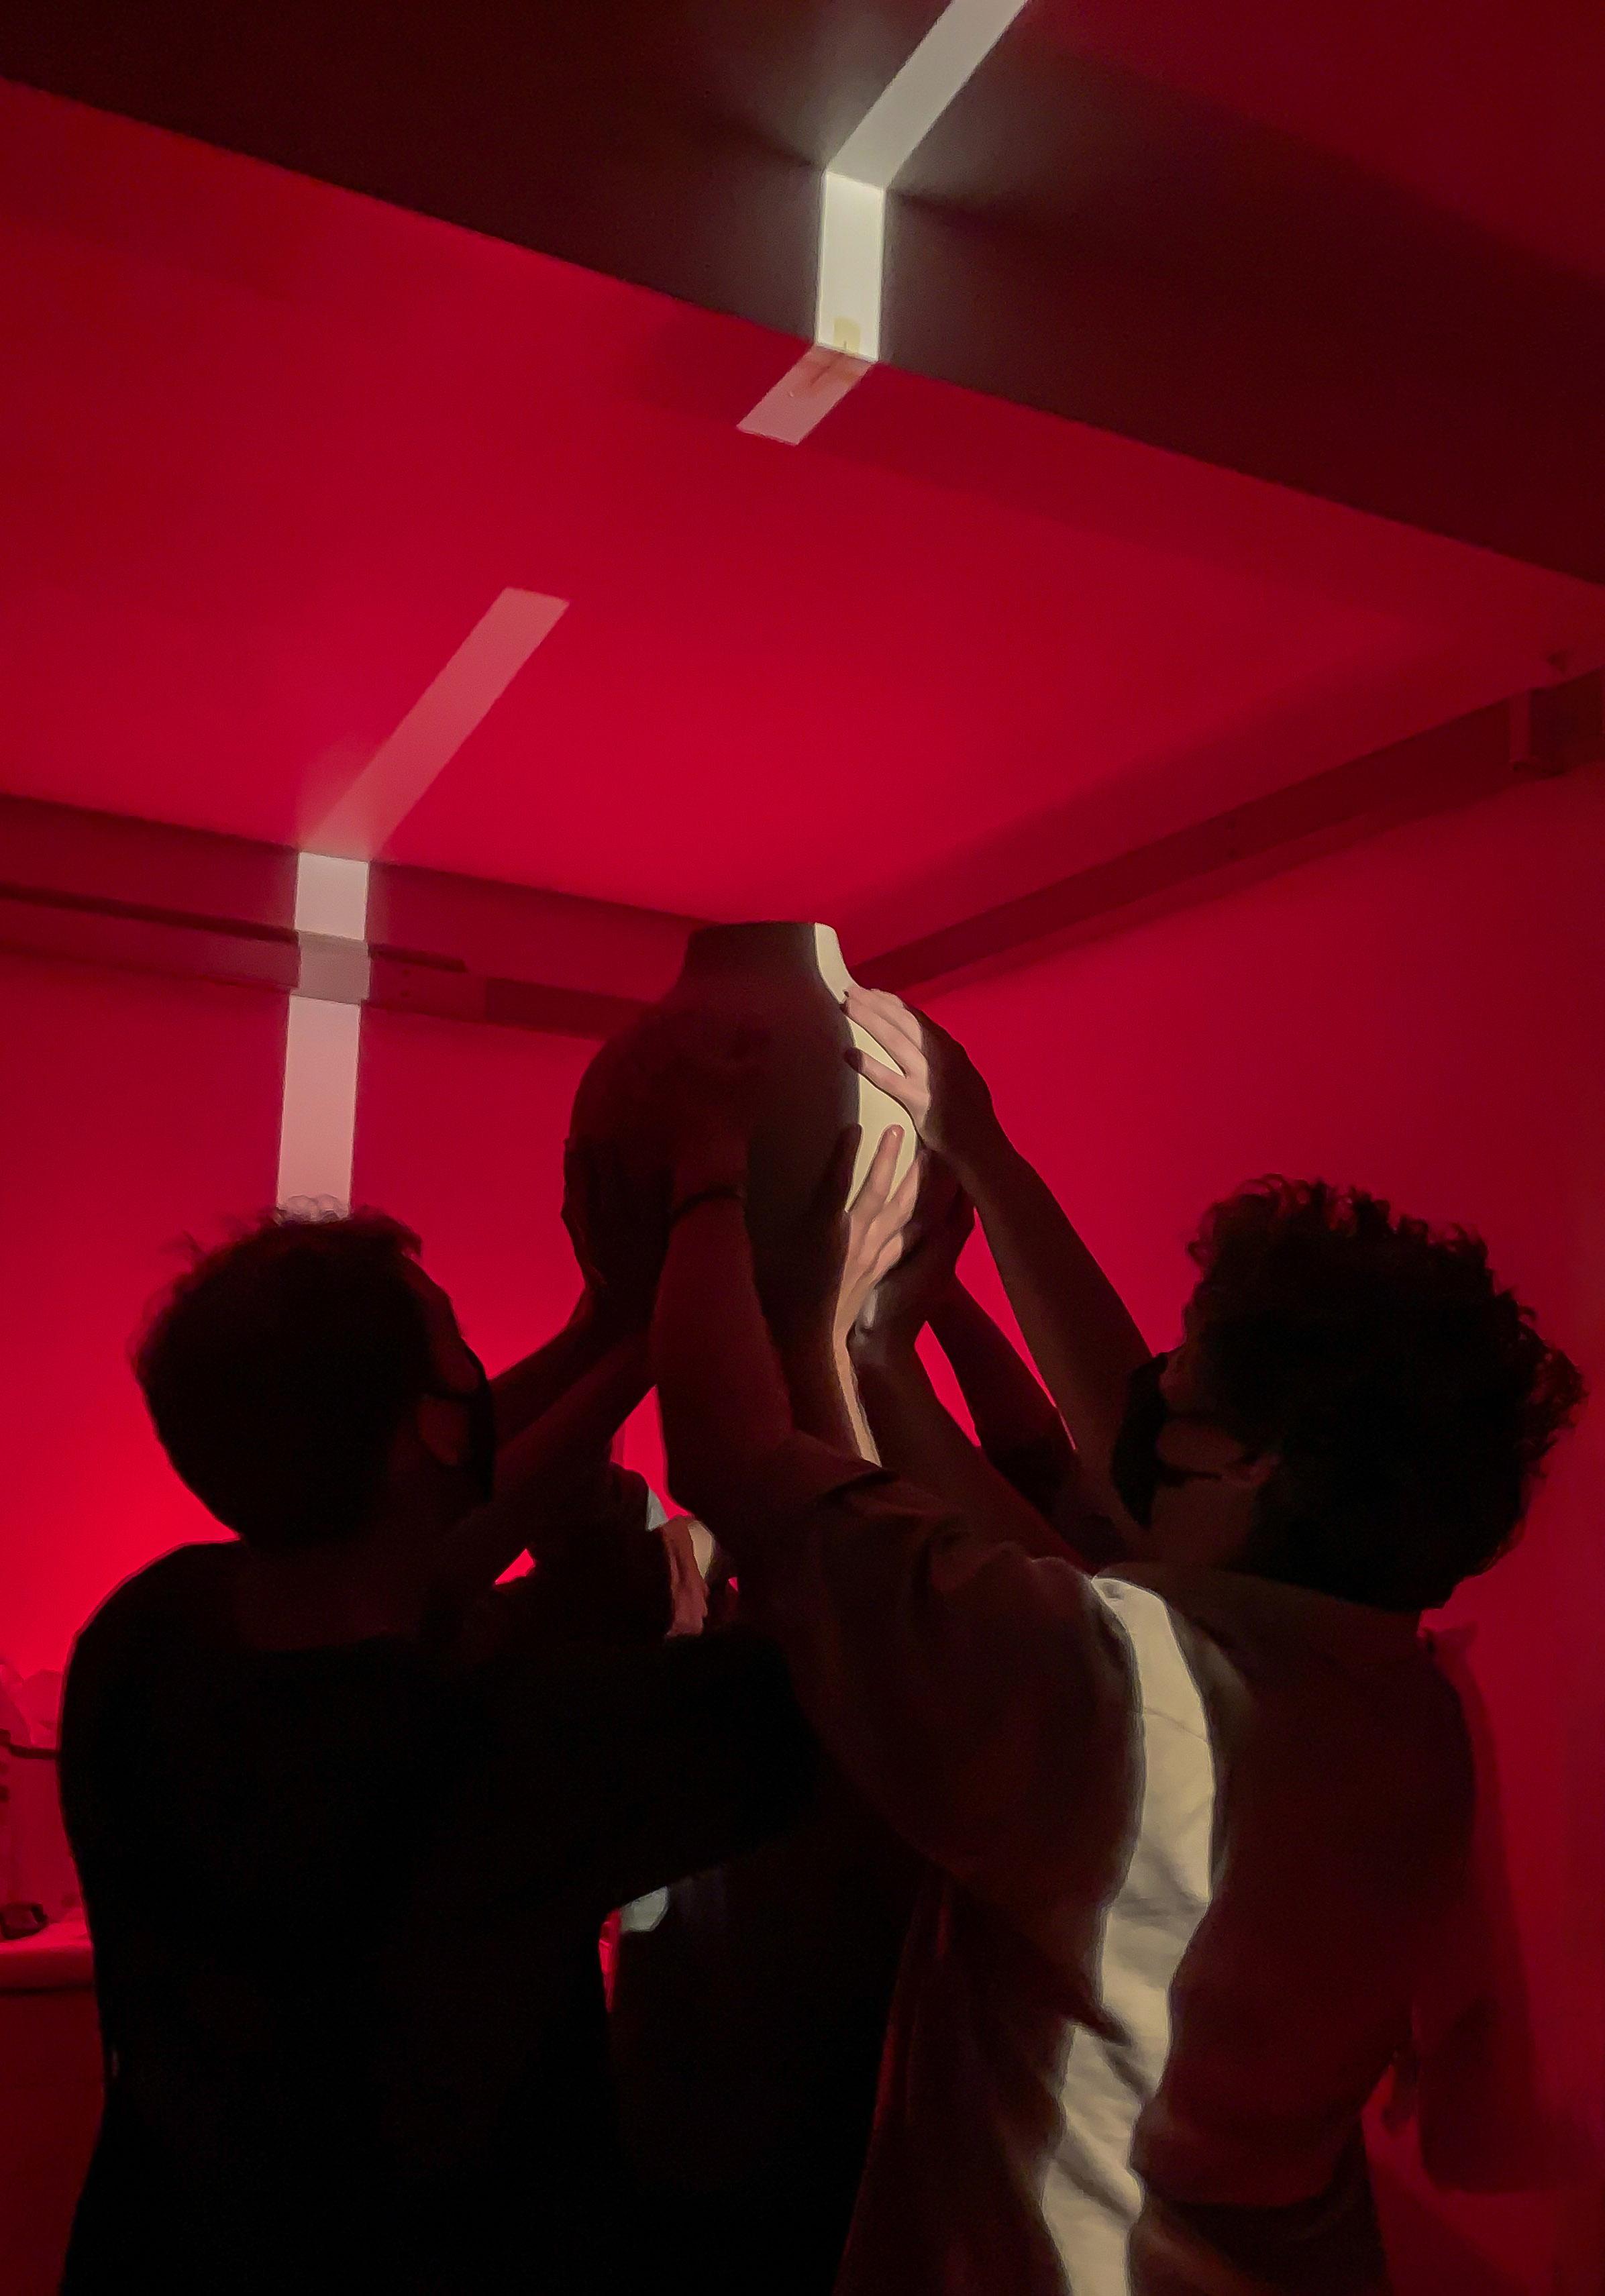 People holding vases in the darkroom